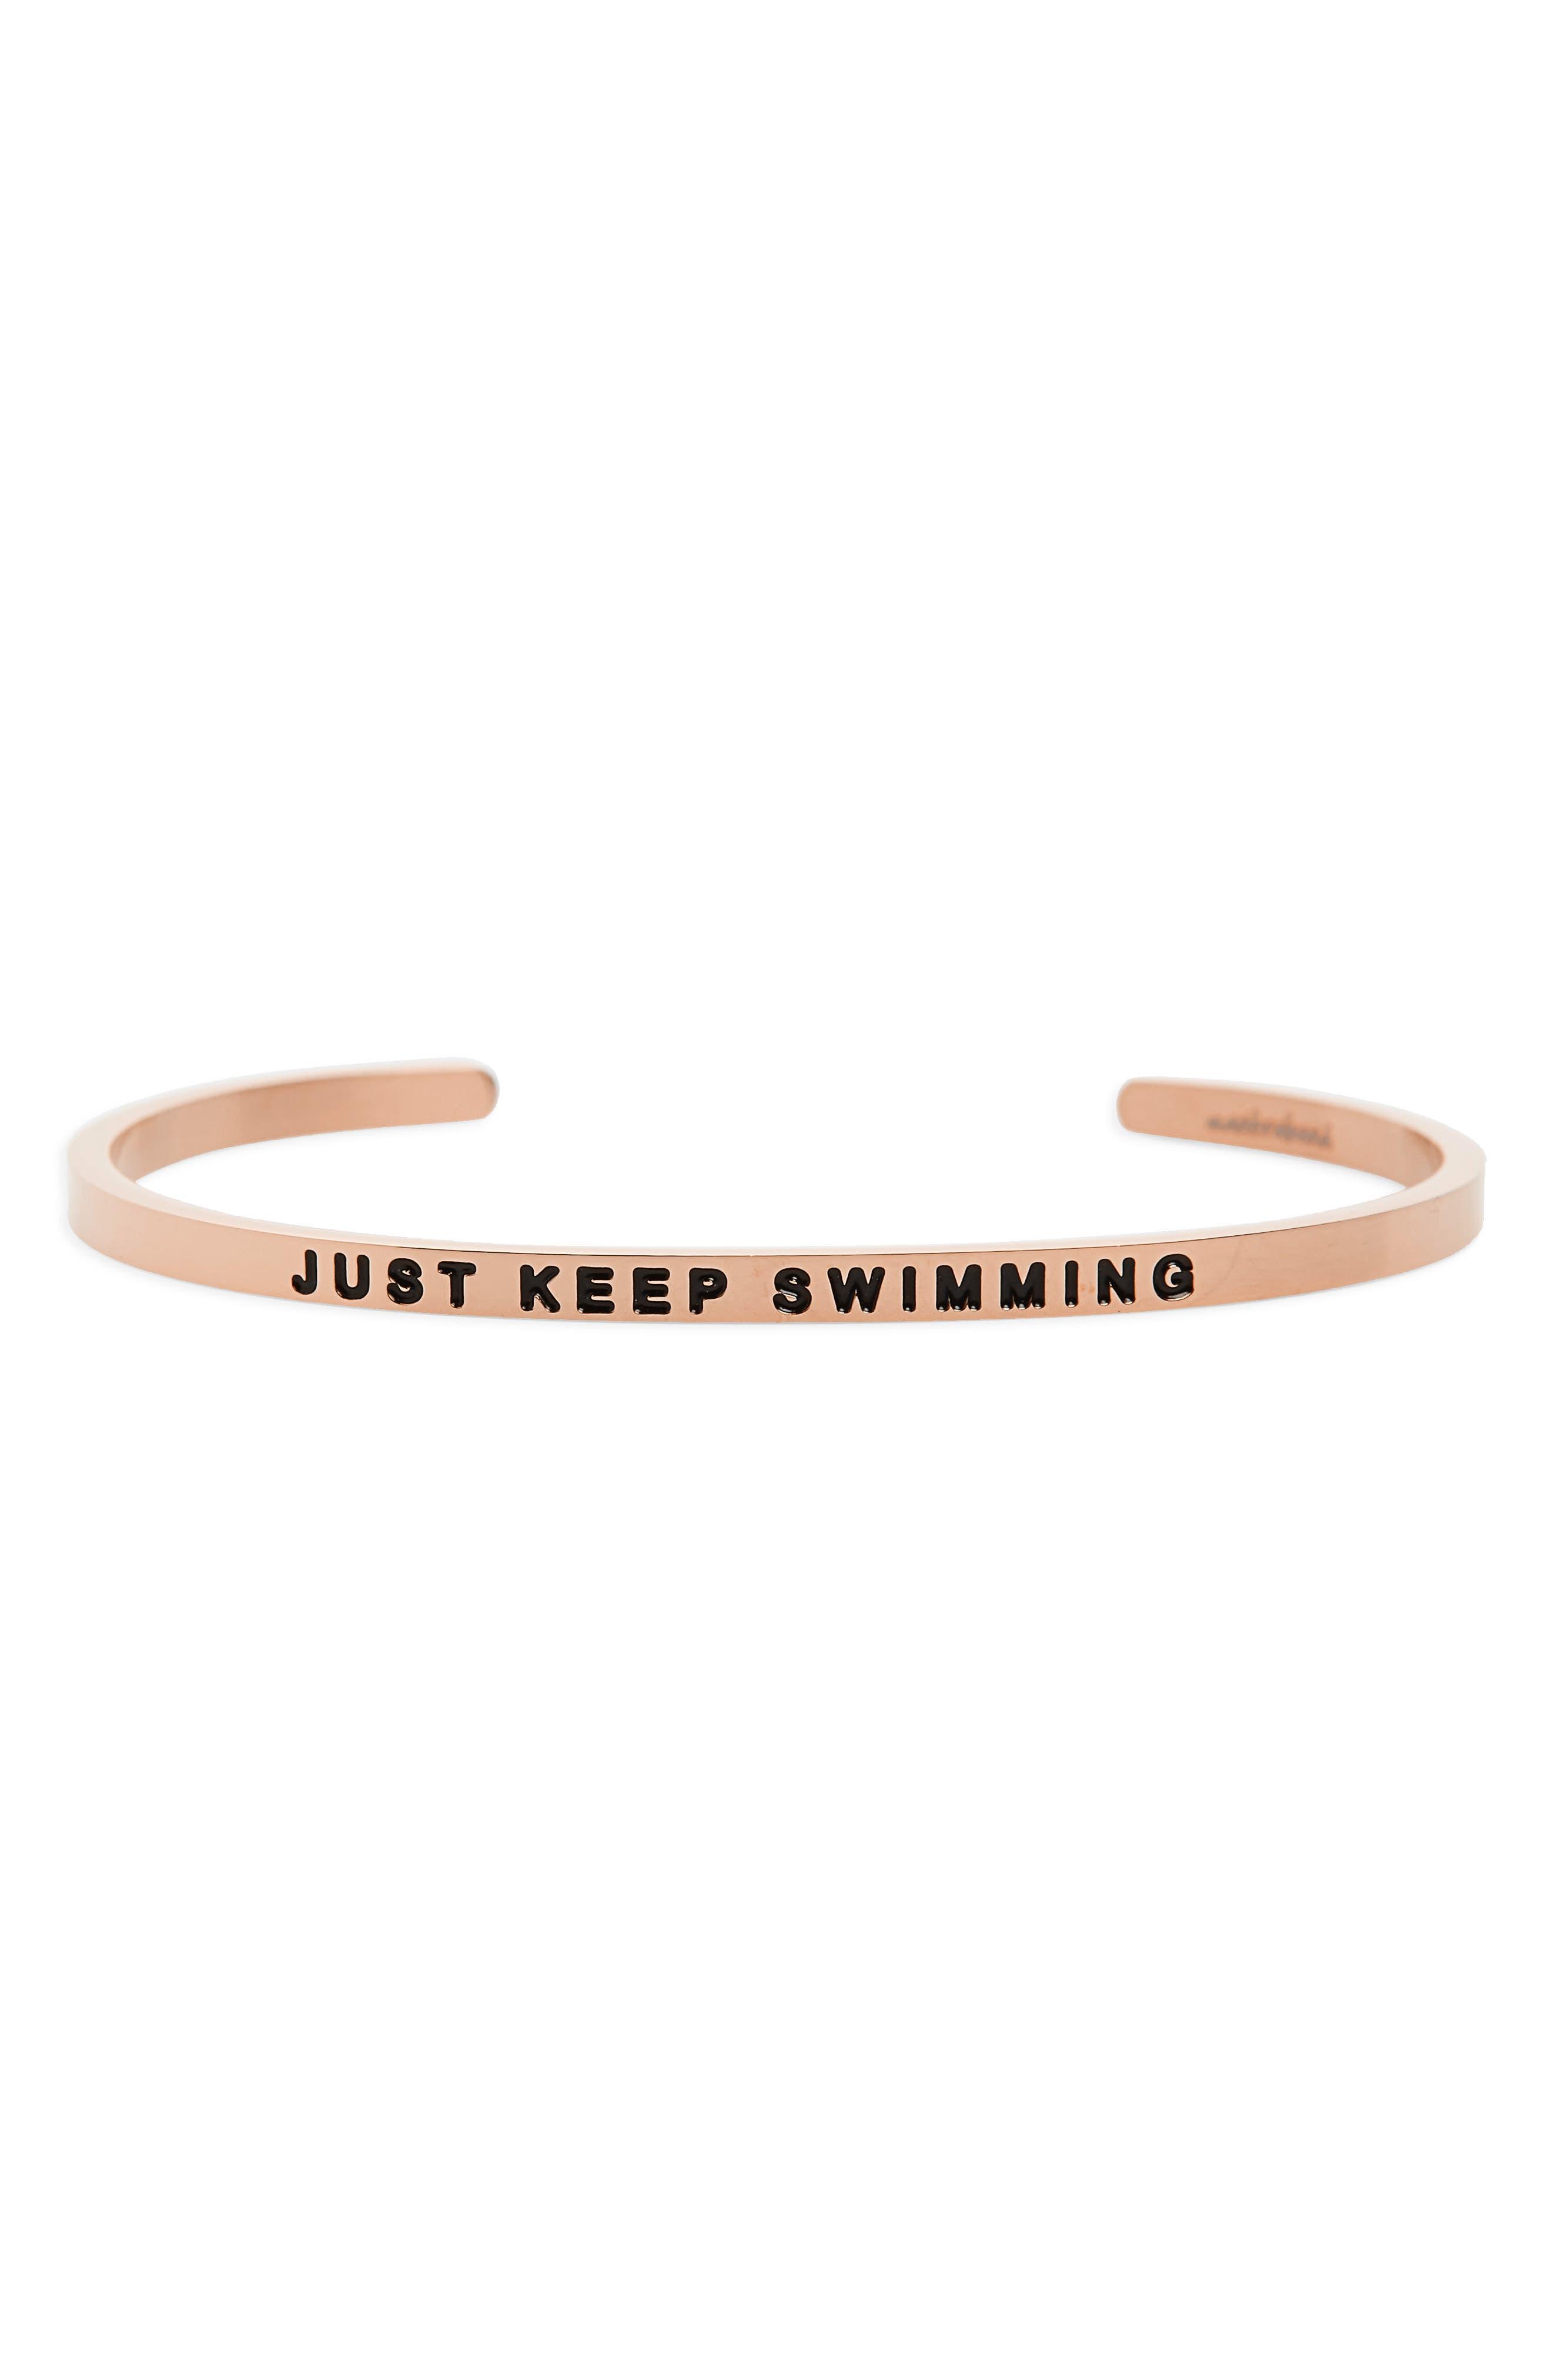 Just Keep Swimming Engraved Cuff,                             Main thumbnail 2, color,